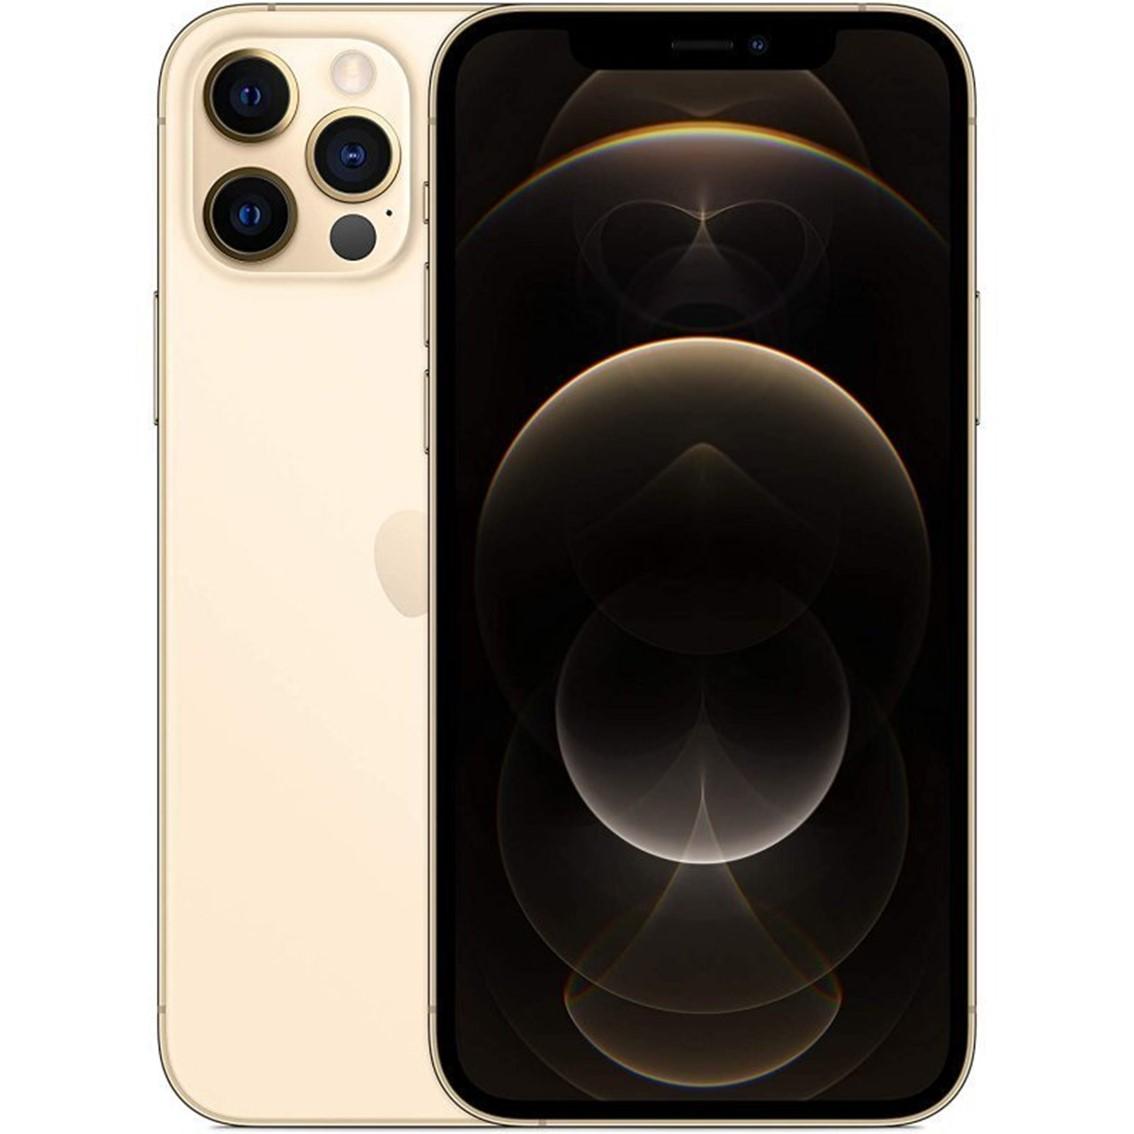 Apple iphone 12 pro 128gb gold sin cargador - sin auriculares - a14 bionic - 12mpx - 6.1 mgmm3ql - a